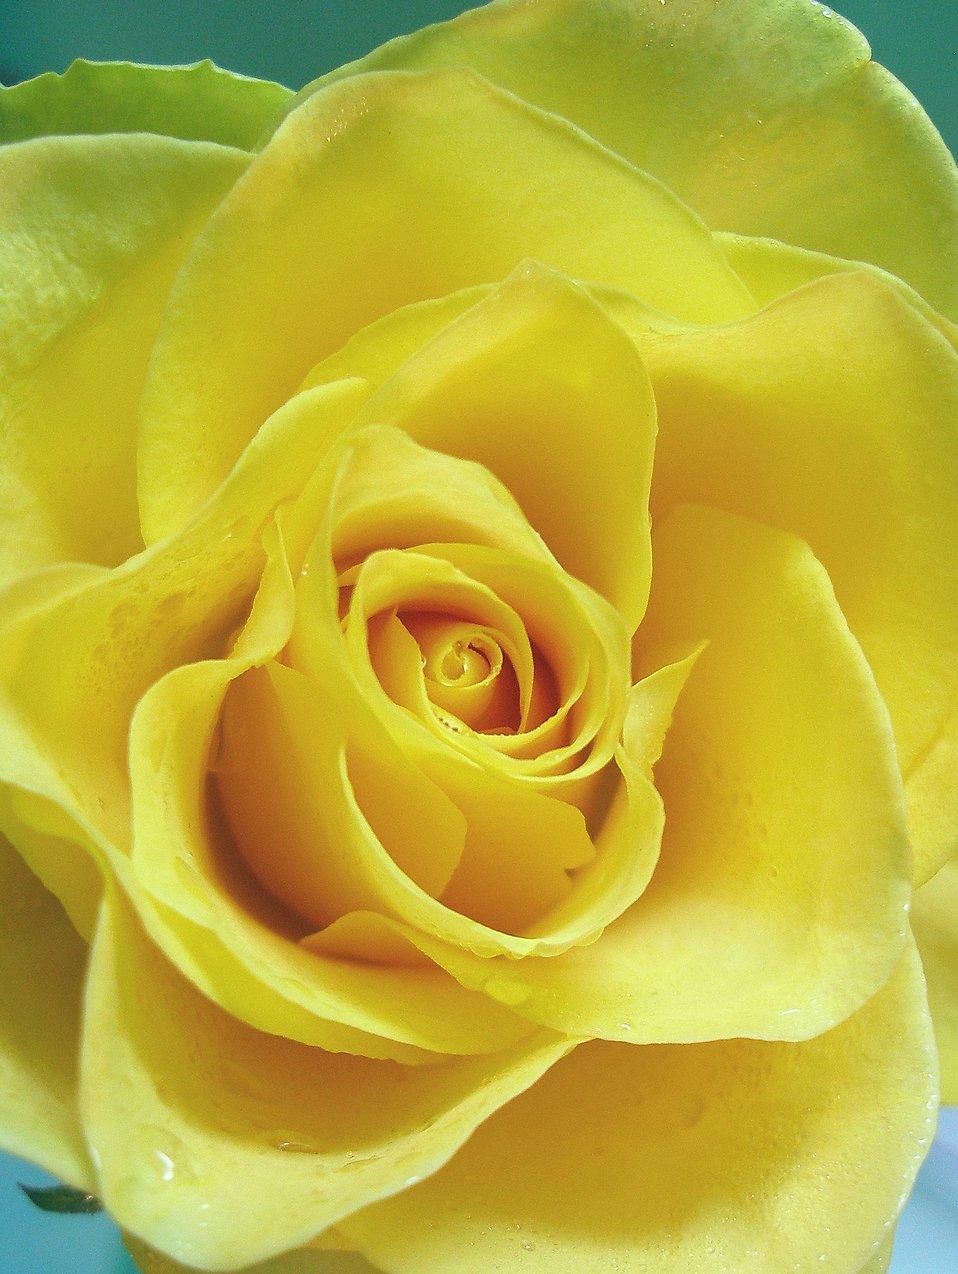 Yellow rose close-up : Free Stock Photo